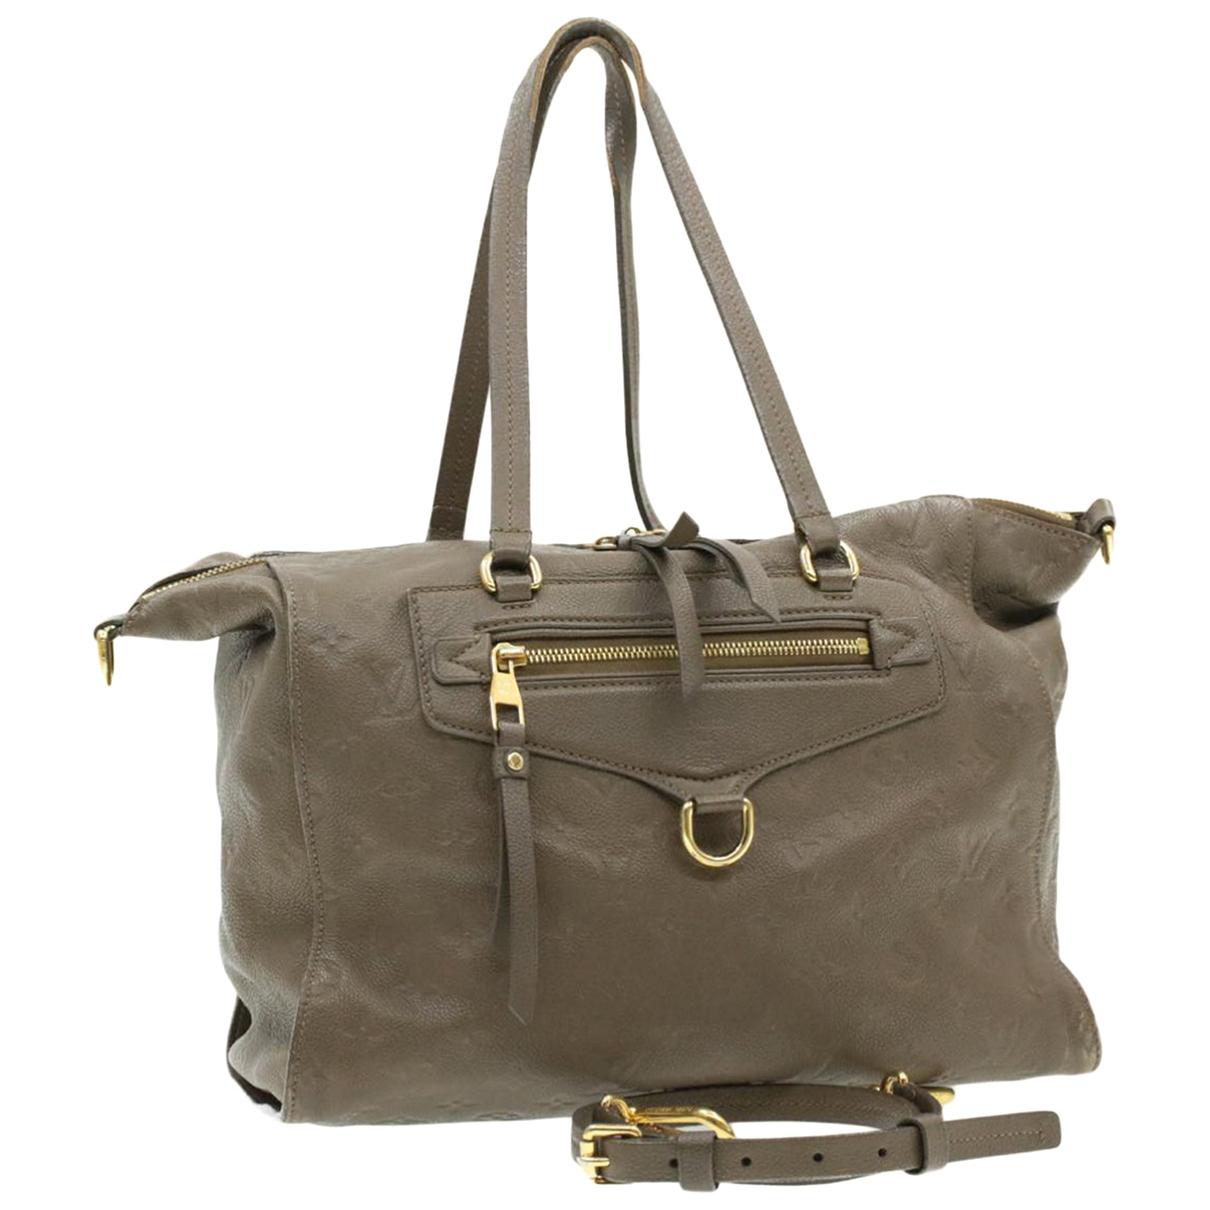 Louis Vuitton \N Grey Leather handbag for Women \N